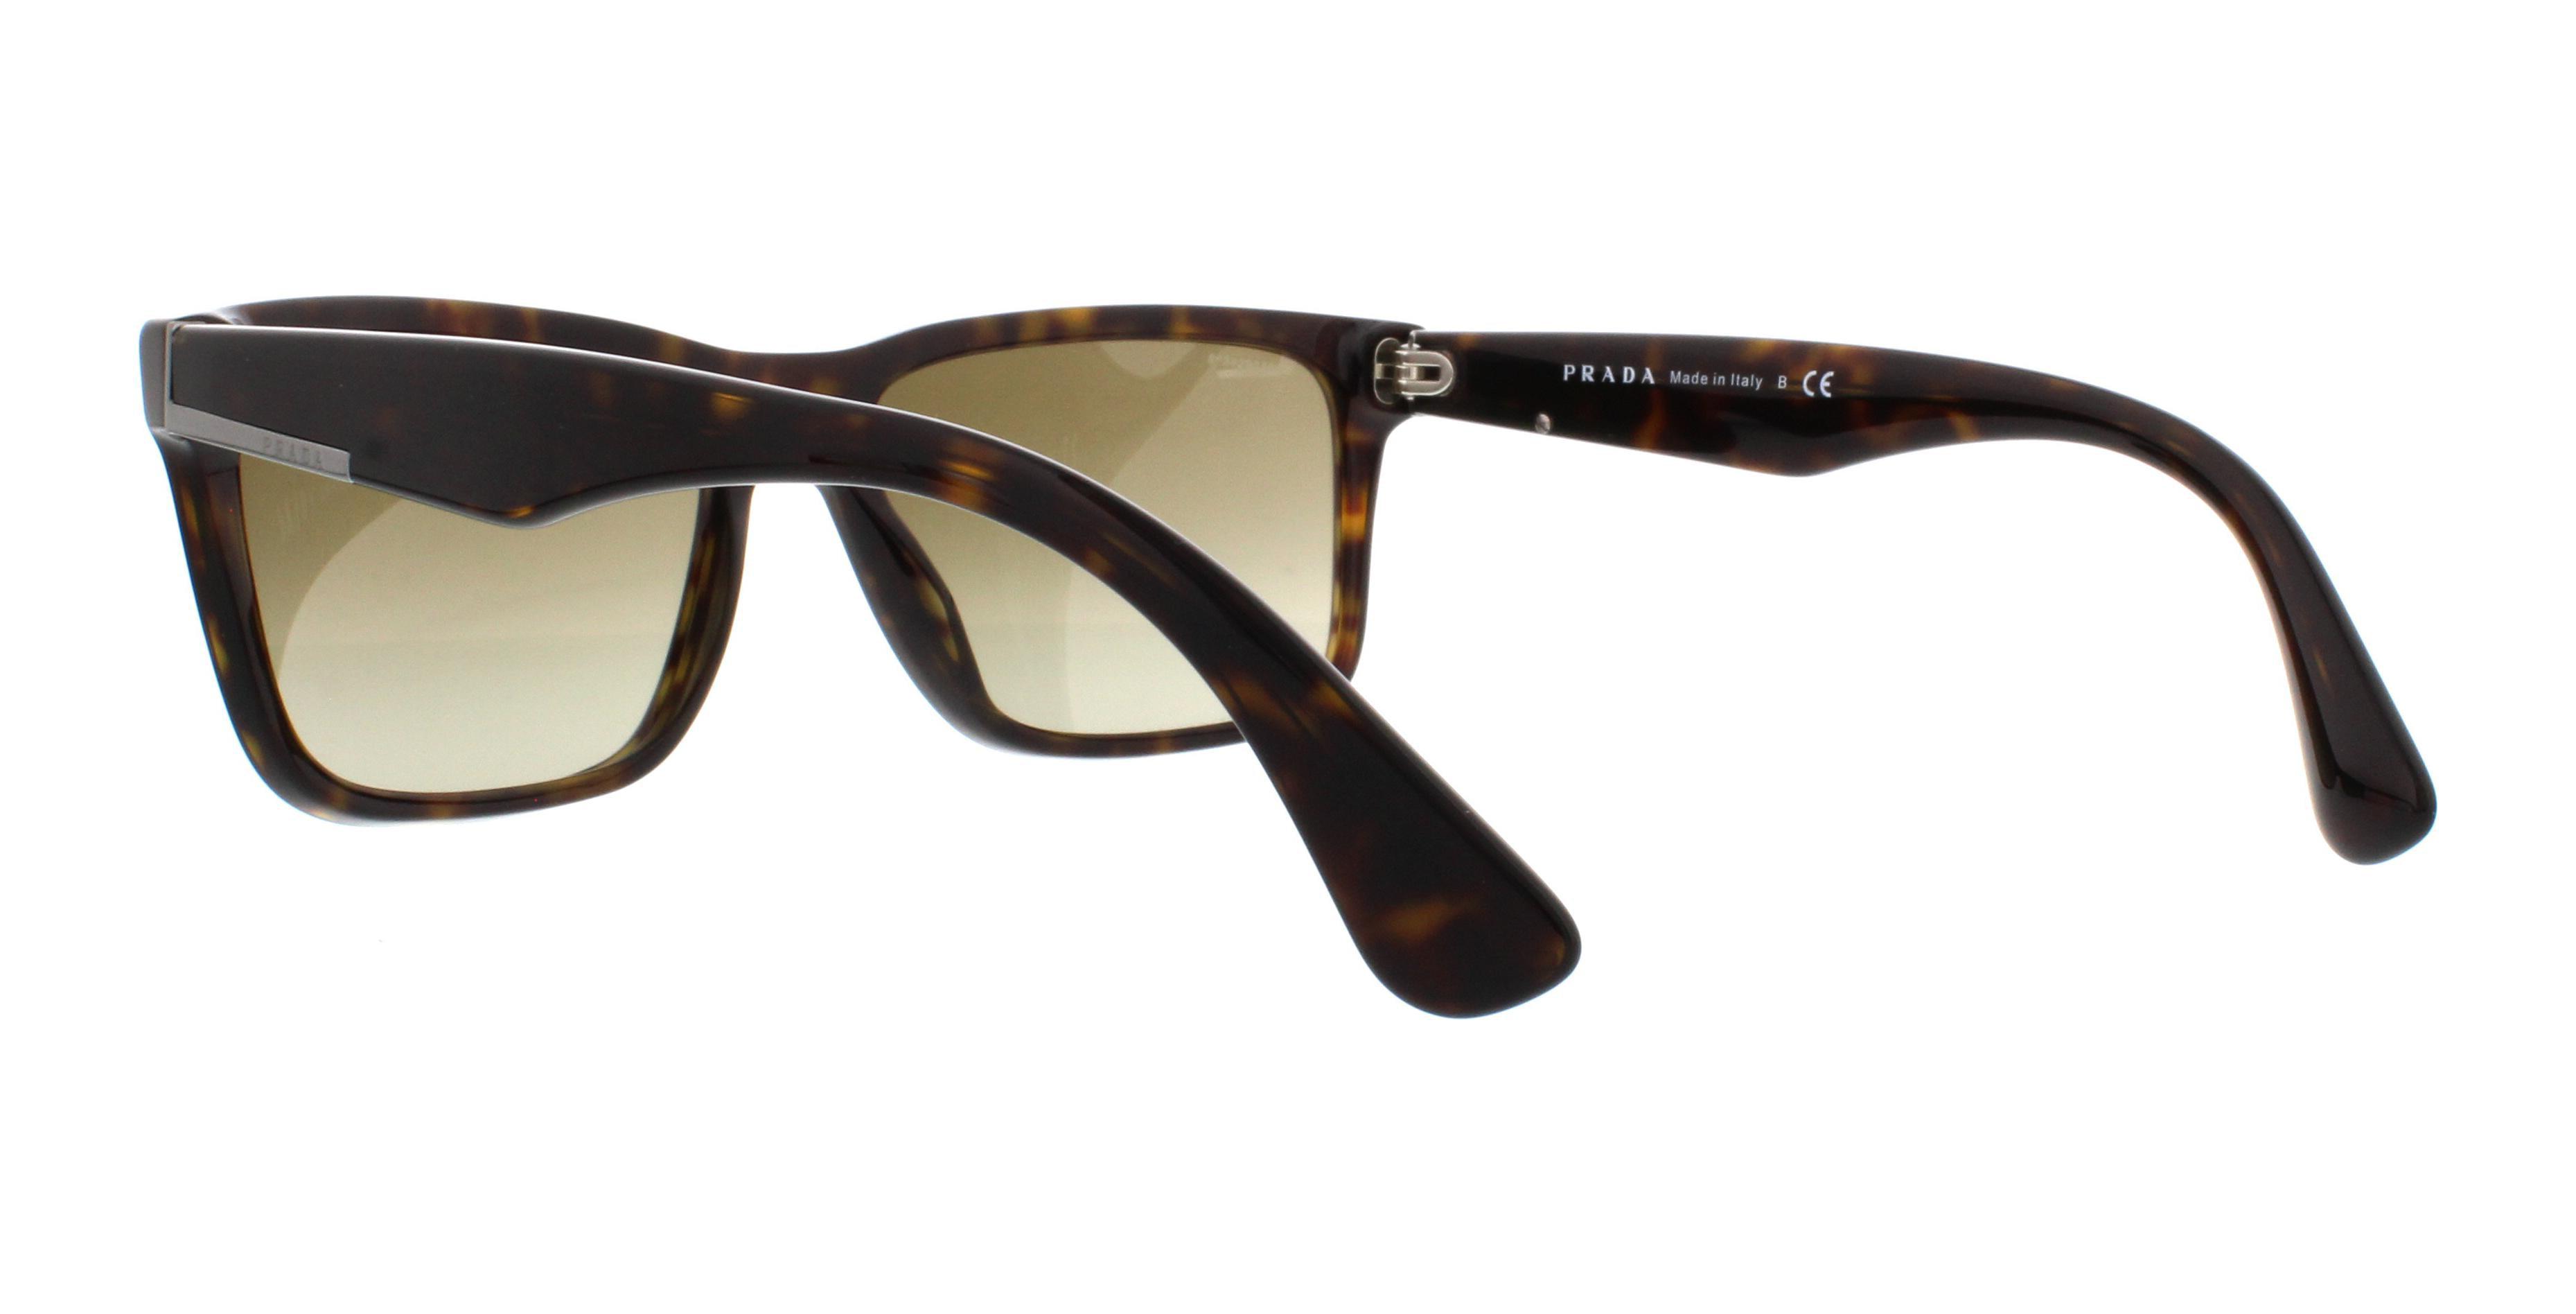 f183e1876898a denmark prada sunglasses c32f4 35f00  wholesale prada sunglasses pr 19ss  2au1x1 havana 59mm walmart 39160 7dddf